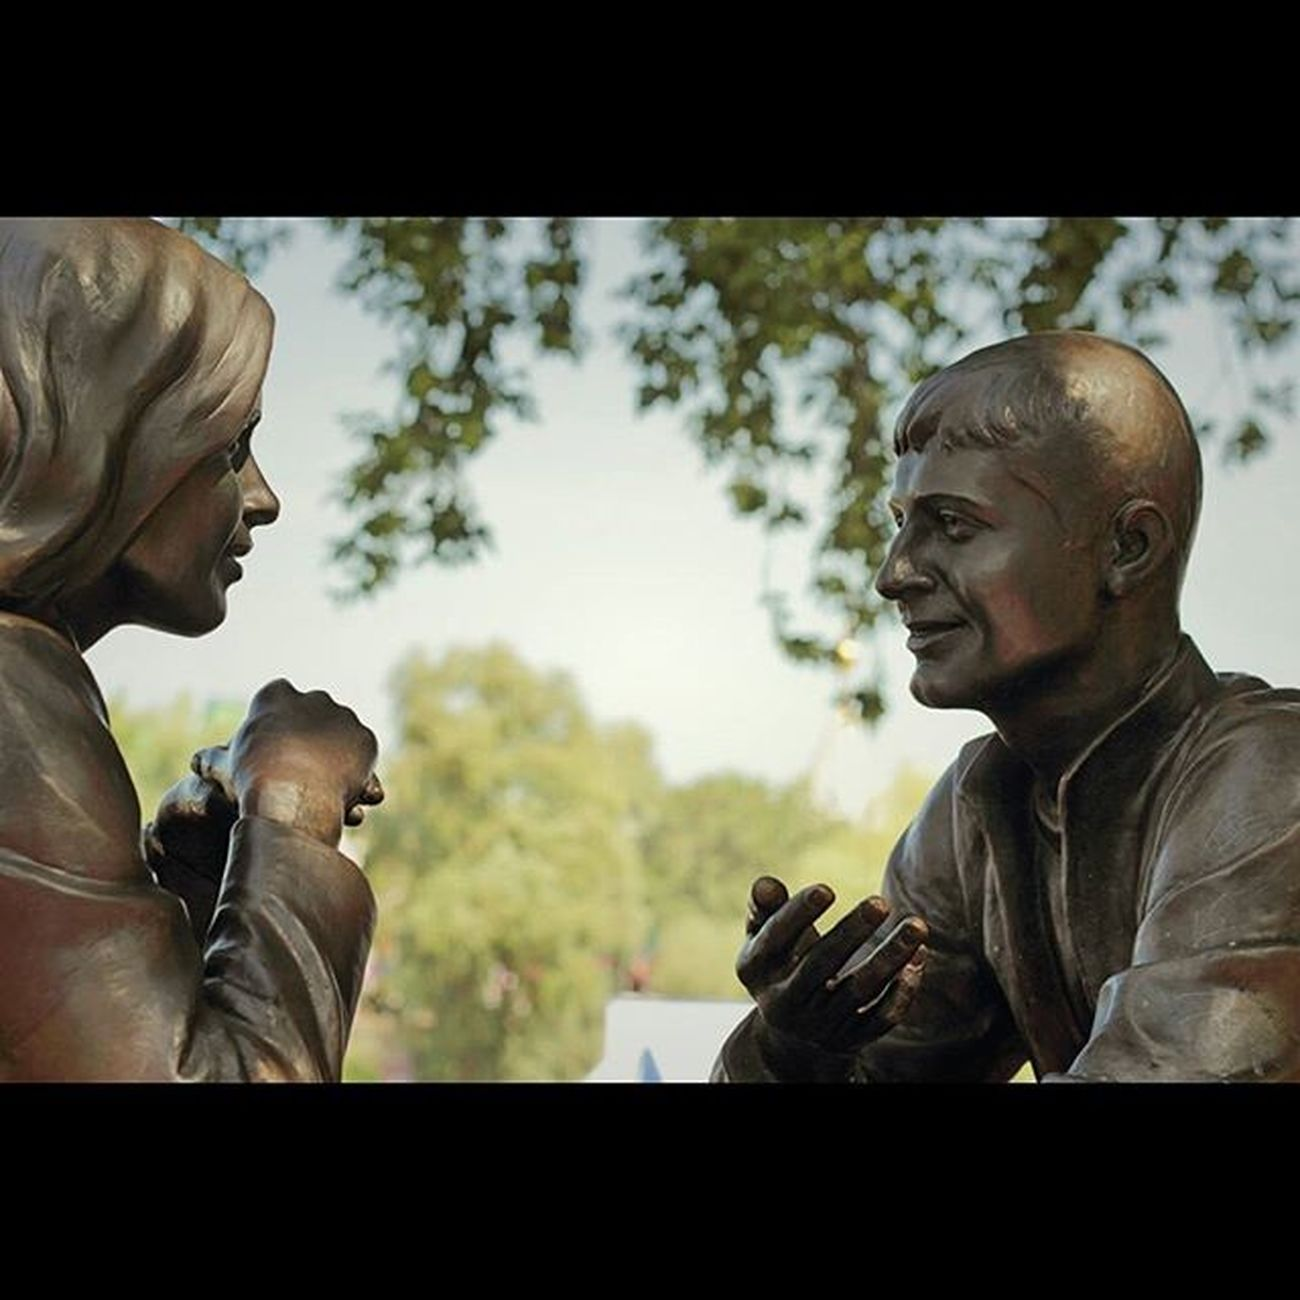 двое влюбленные беседа встреча скульптура Омск two imagery statuary sweetheart omsk openomsk